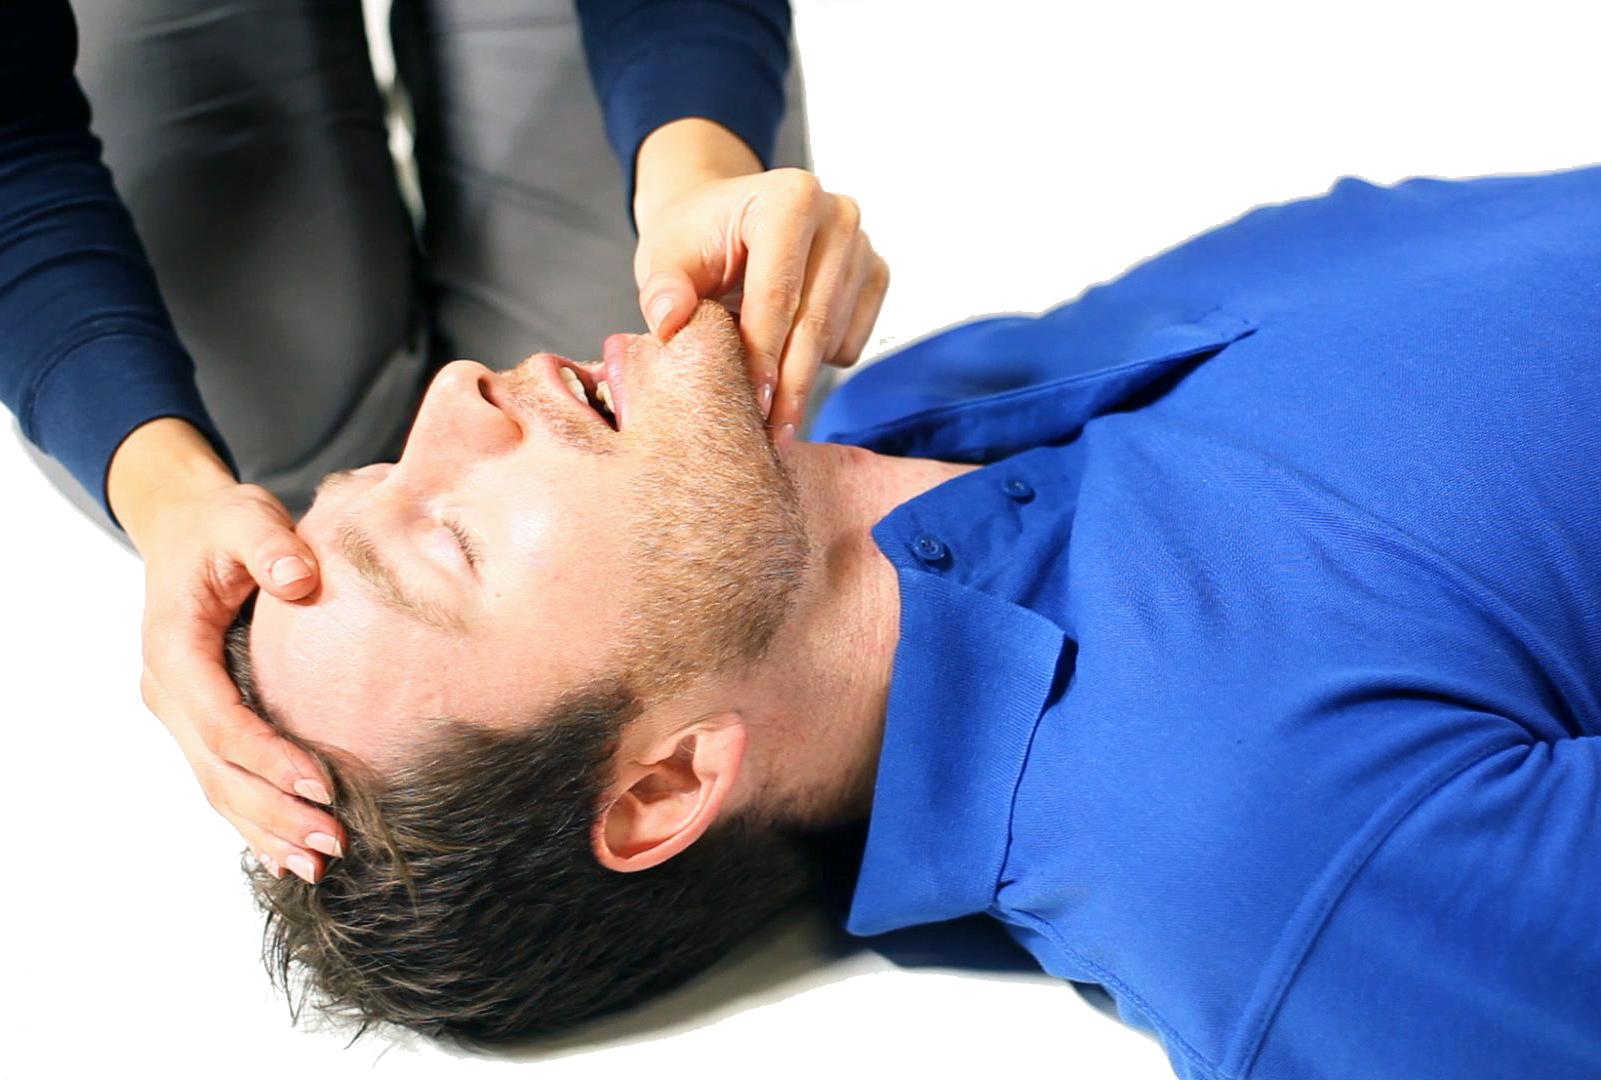 Resuscitation for man